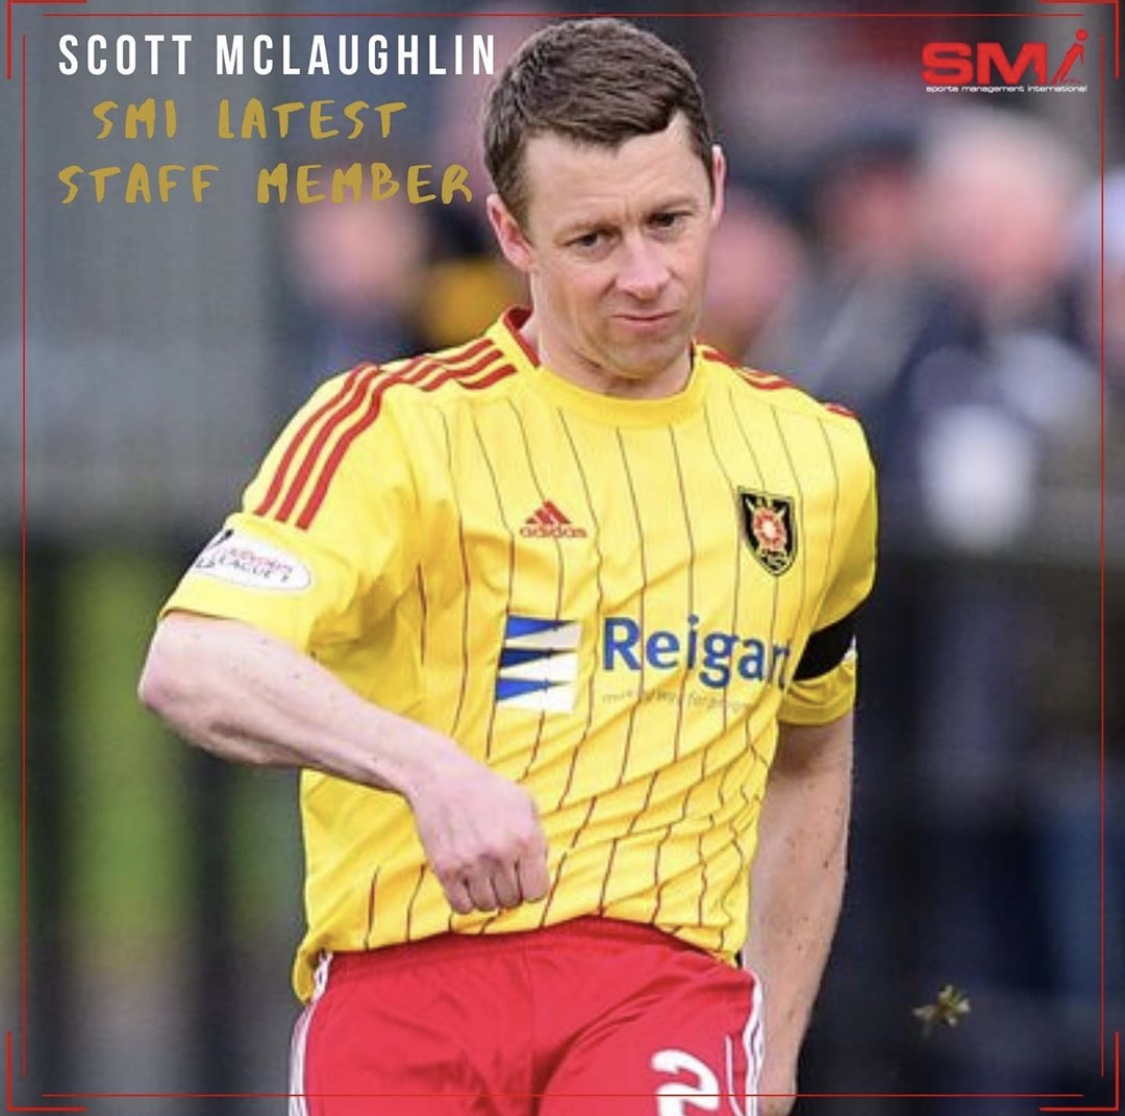 SMI Newest Staff member Scott McLaughlin